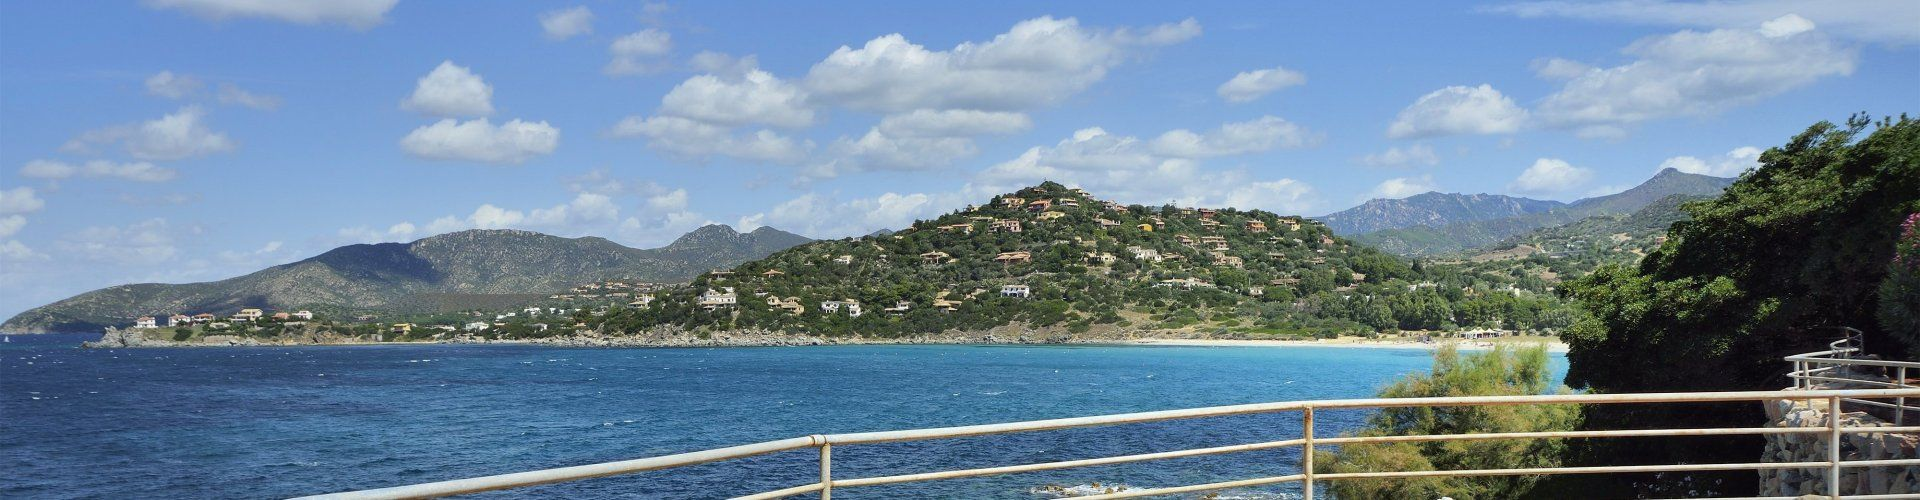 Villa Bella in Torre delle Stelle